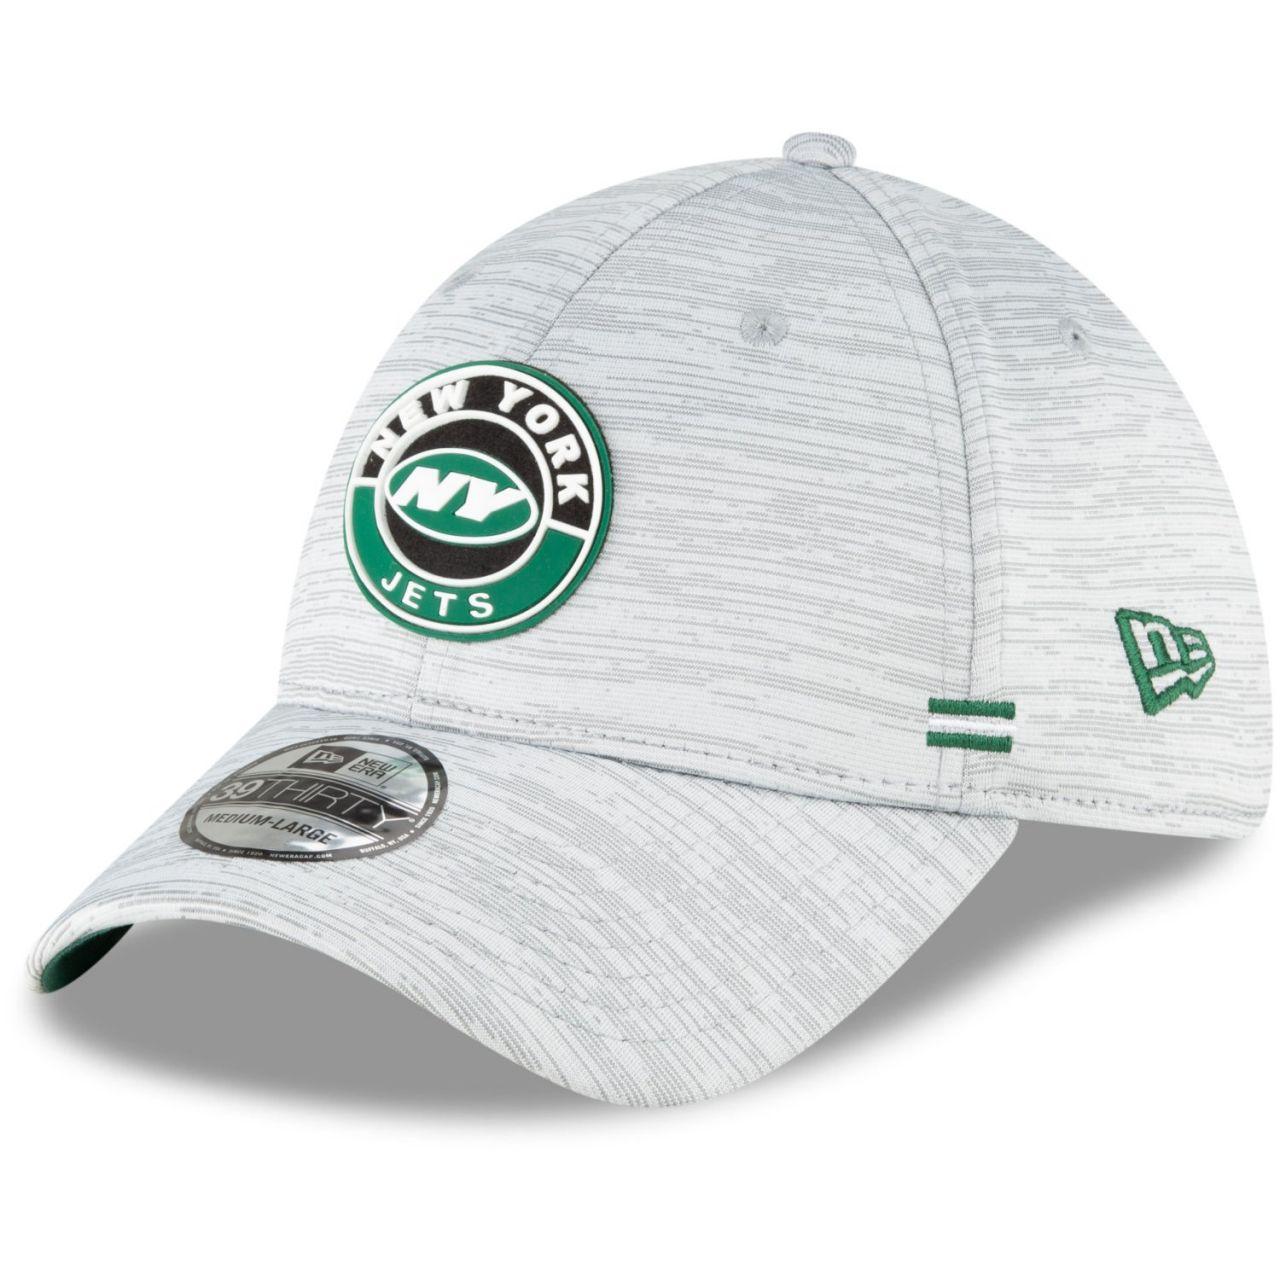 amfoo - New Era 39Thirty Cap - SIDELINE 2020 New York Jets